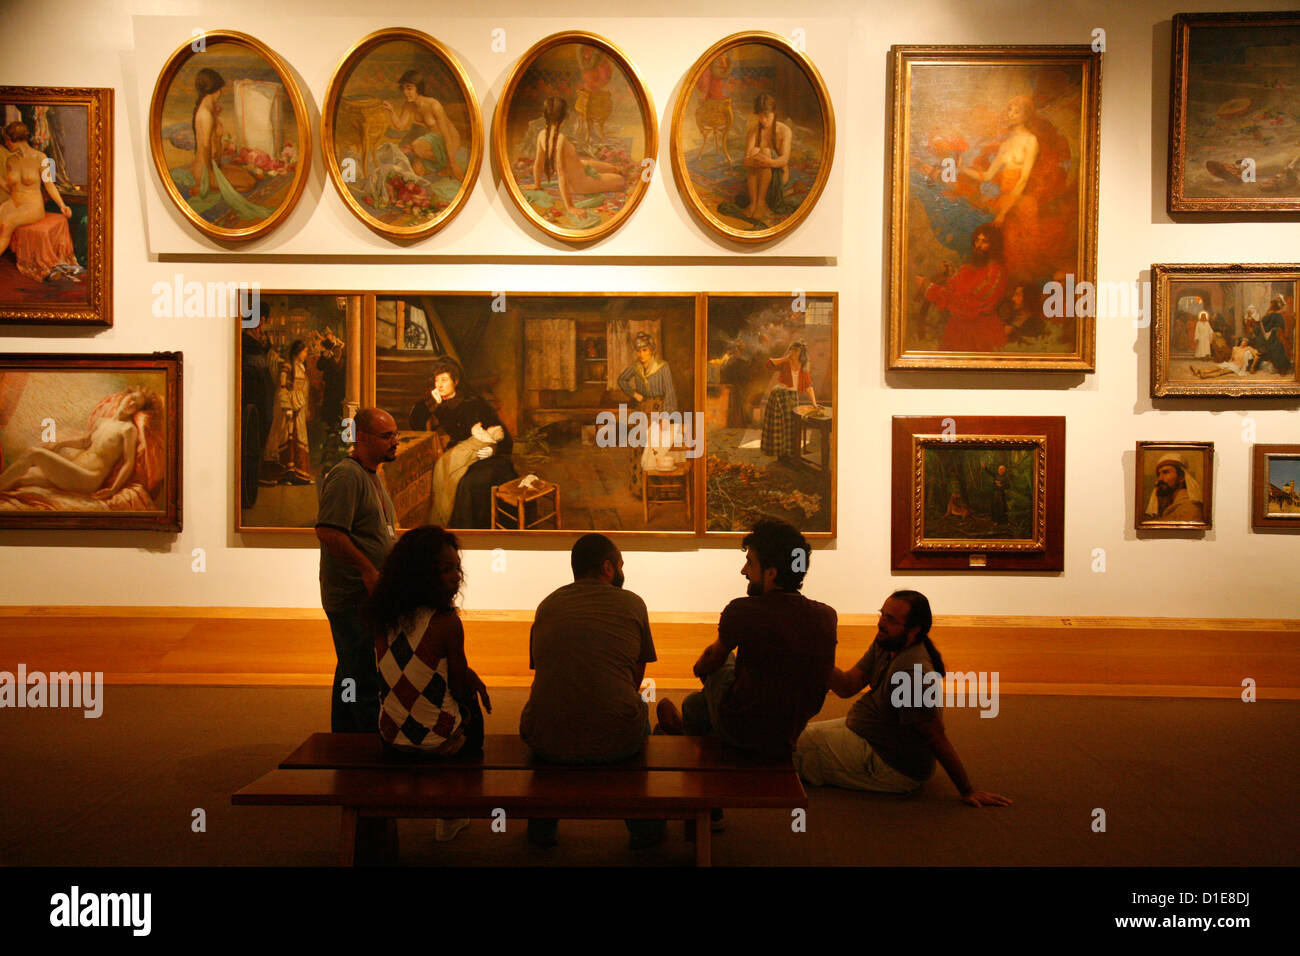 Pinacoteca do Estado (State Art Gallery), Sao Paulo, Brazil, South America - Stock Image